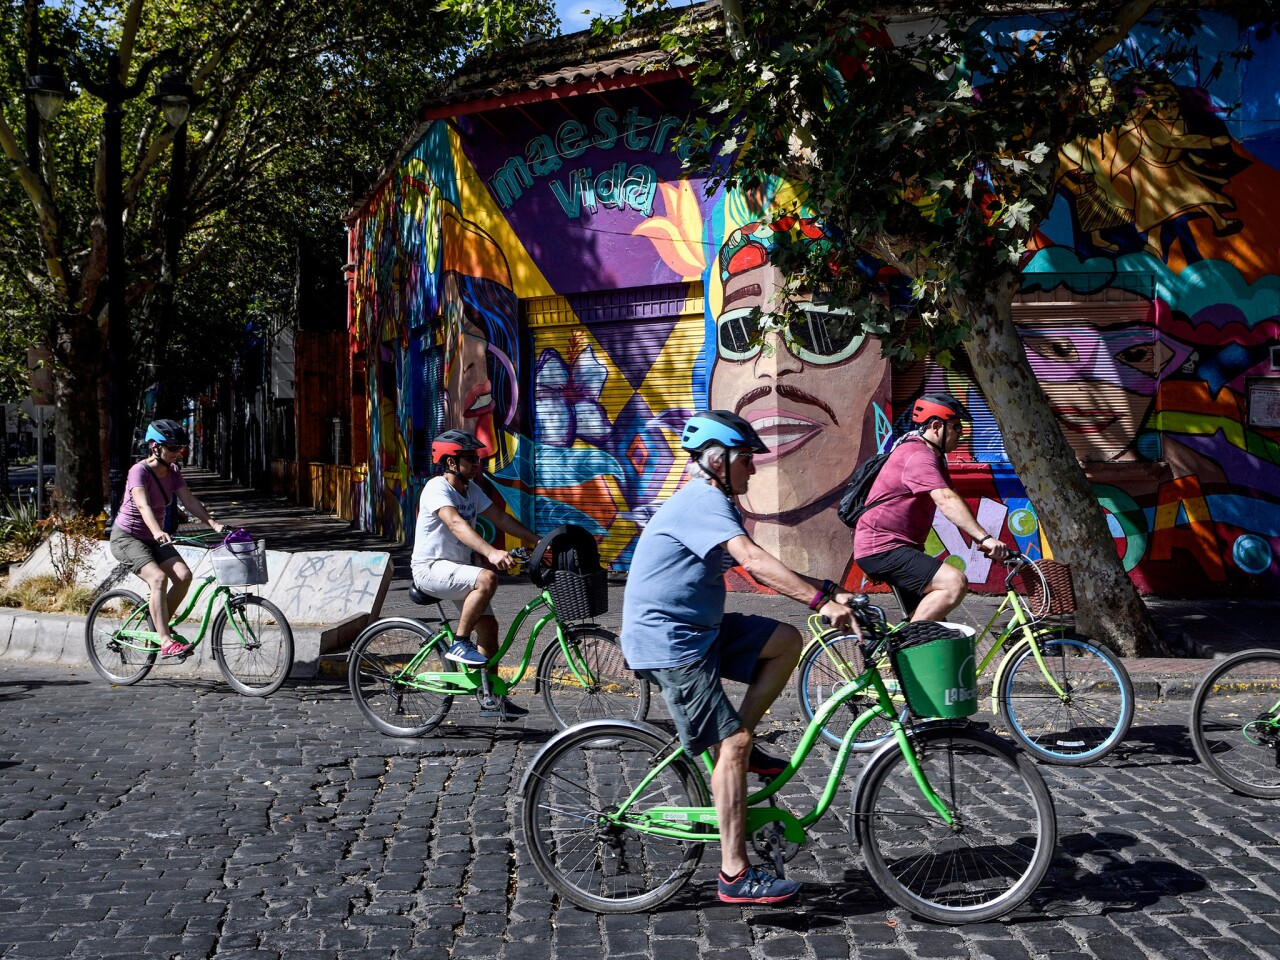 Biking in Chile